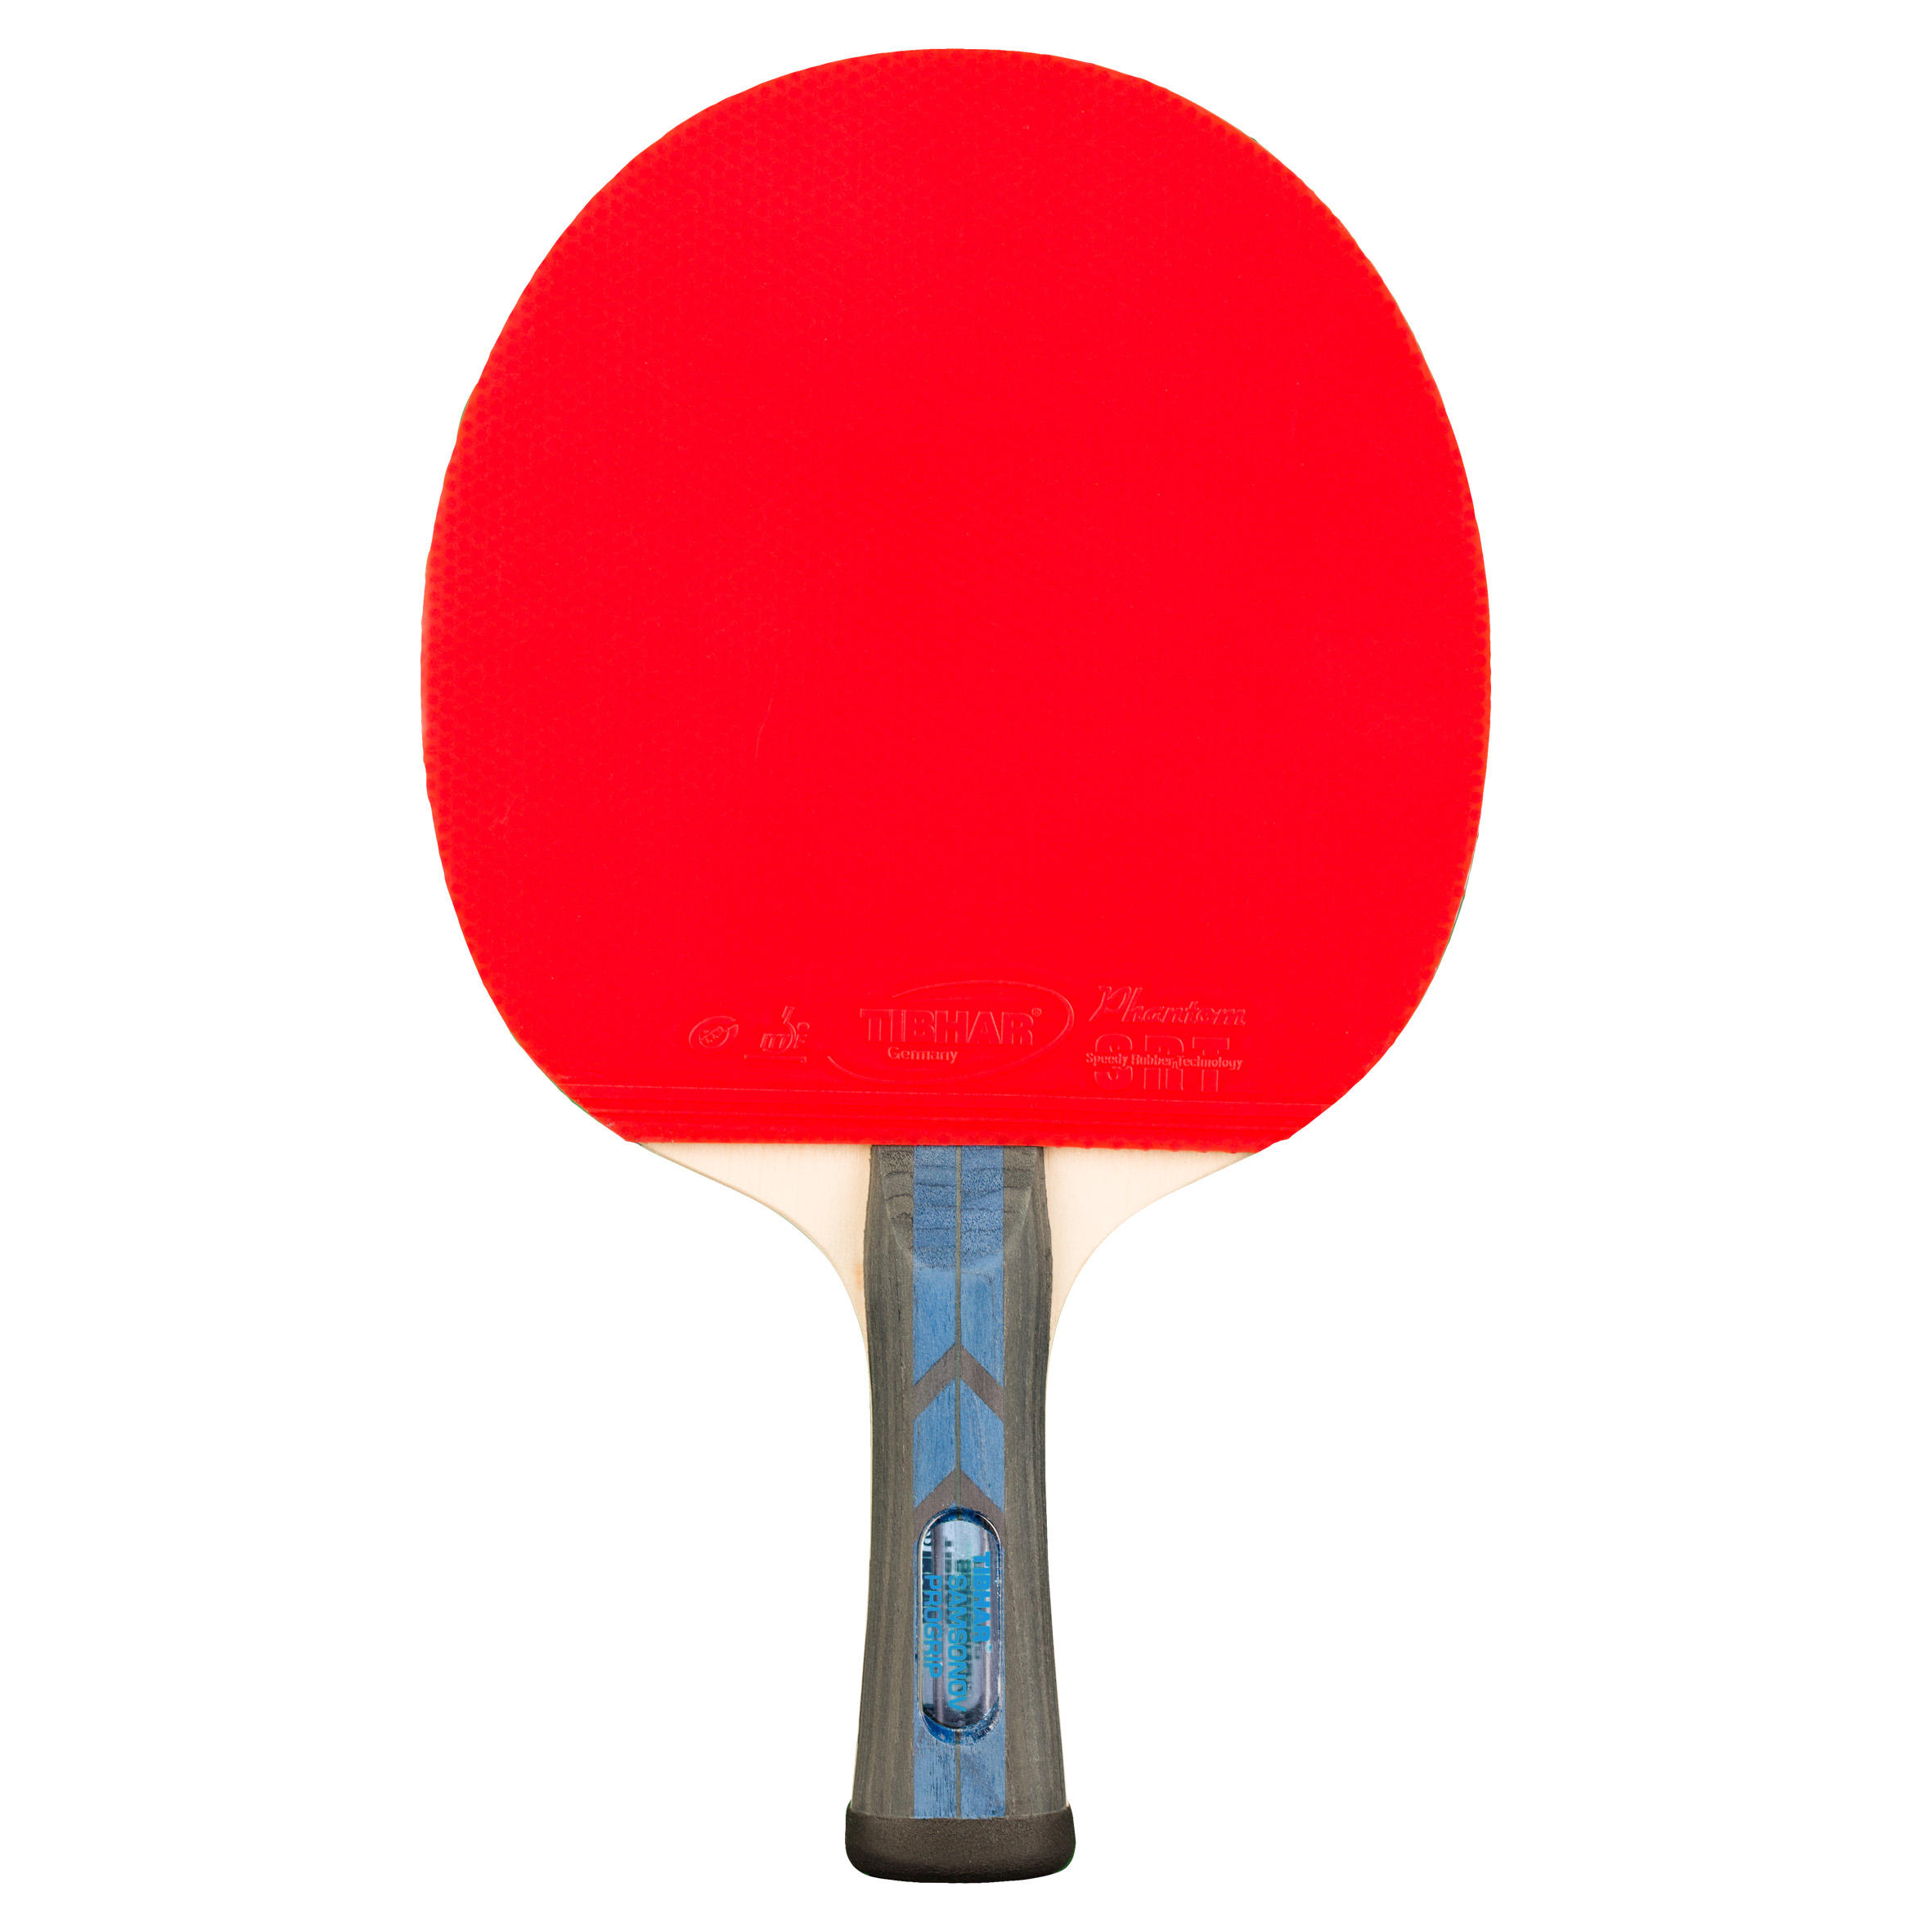 Paletă tenis TIBHAR Progrip la Reducere poza